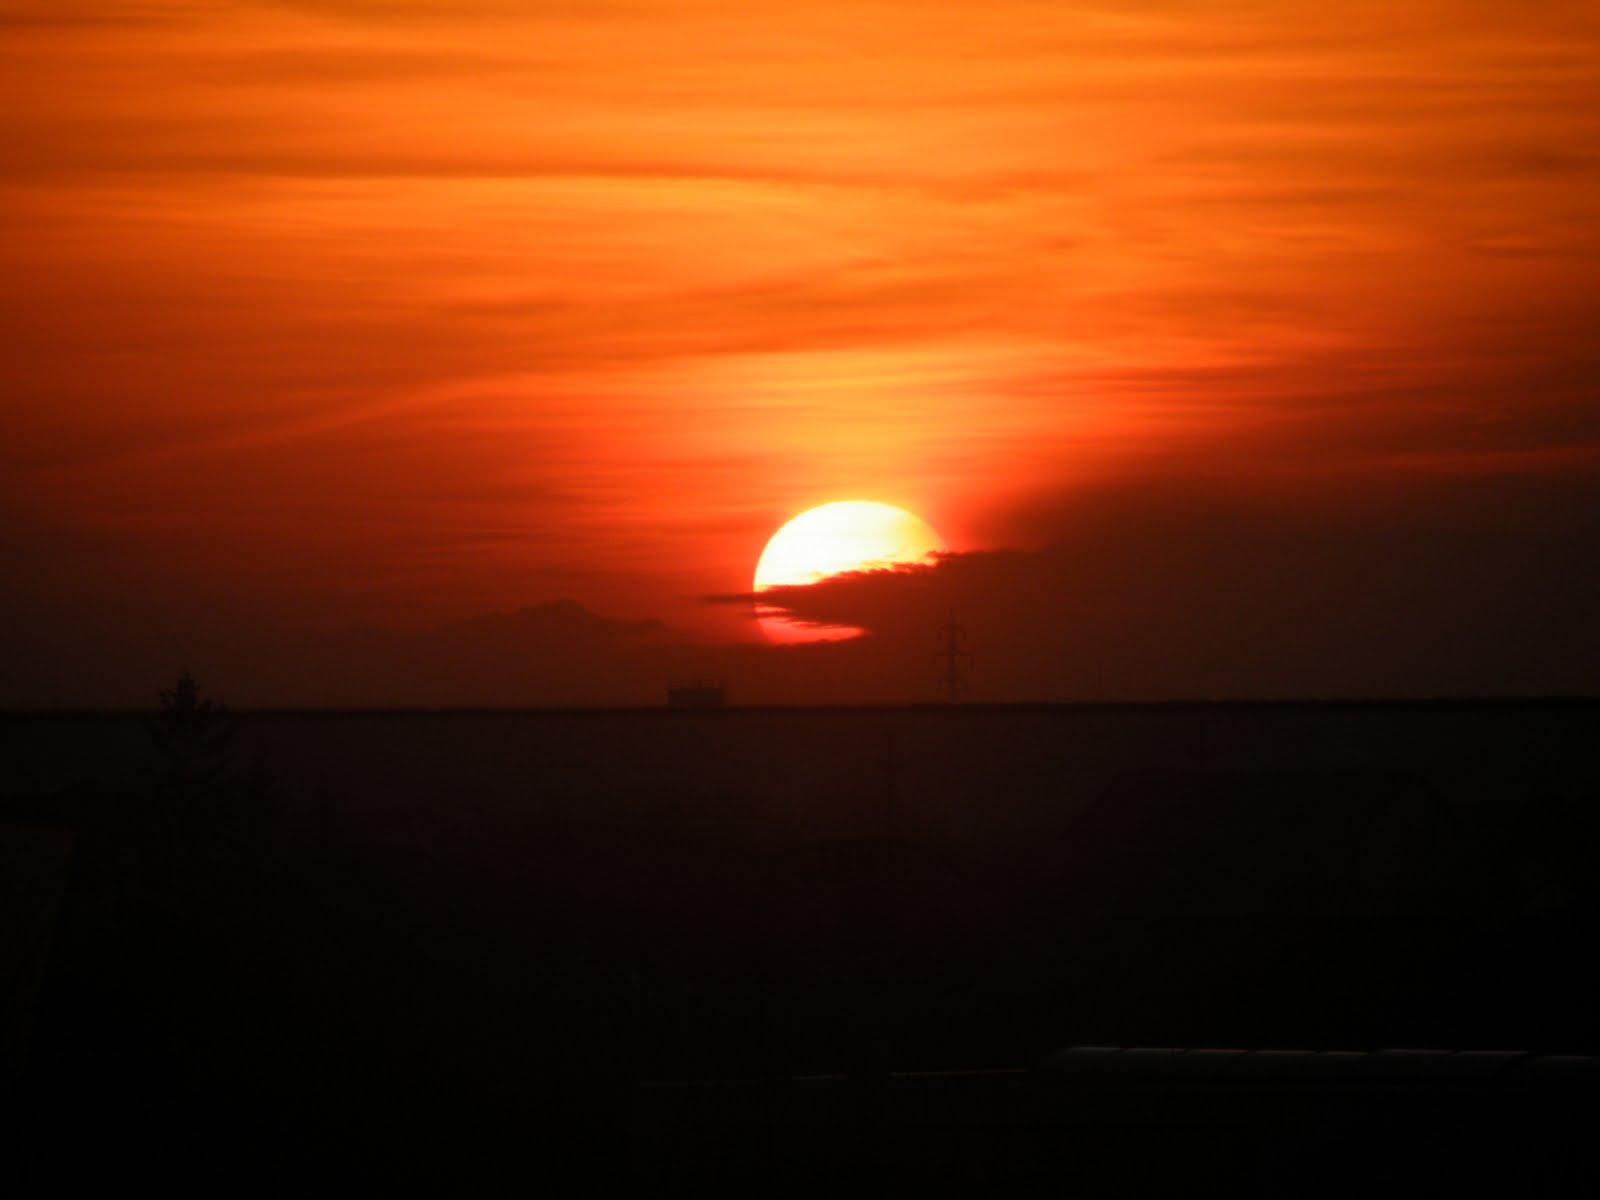 http://3.bp.blogspot.com/_DYOTf0Z50jU/SwxzS9eFBKI/AAAAAAAAAII/cqIWkDOUzvY/s1600/sunset_by_cainele9.jpg